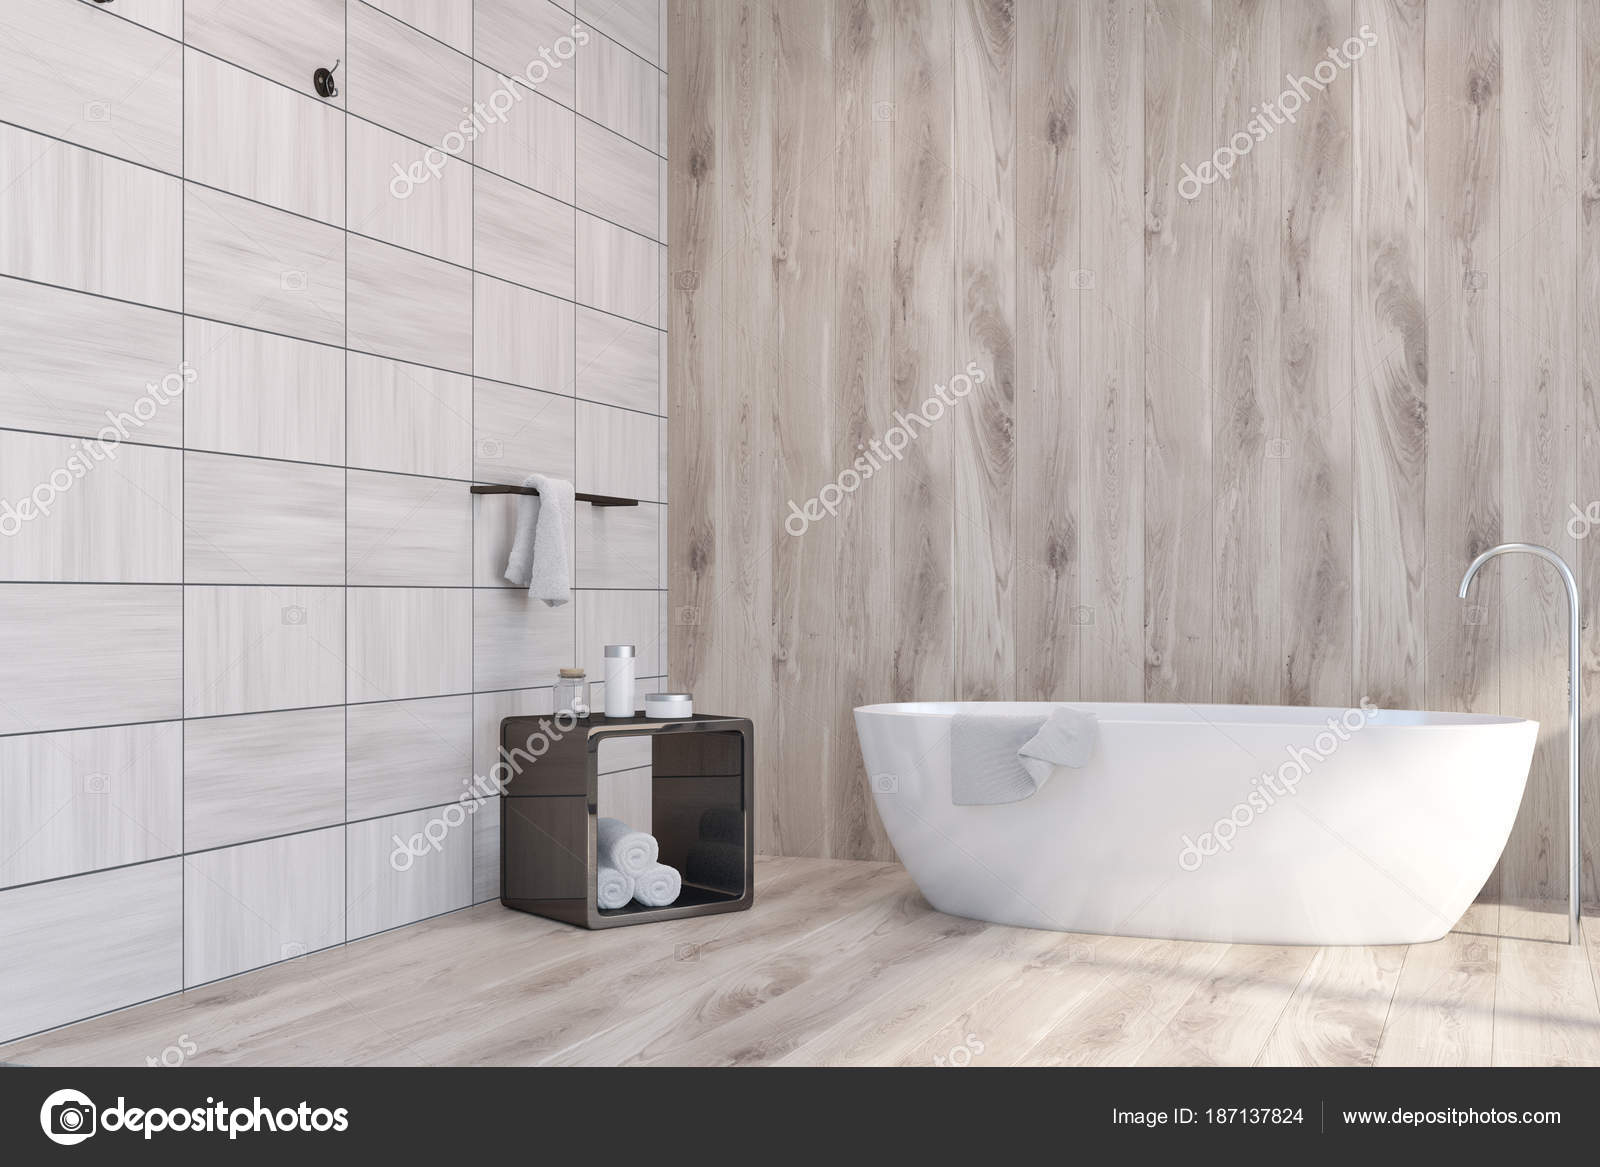 Houten tegels badkamer hoek bad u2014 stockfoto © denisismagilov #187137824